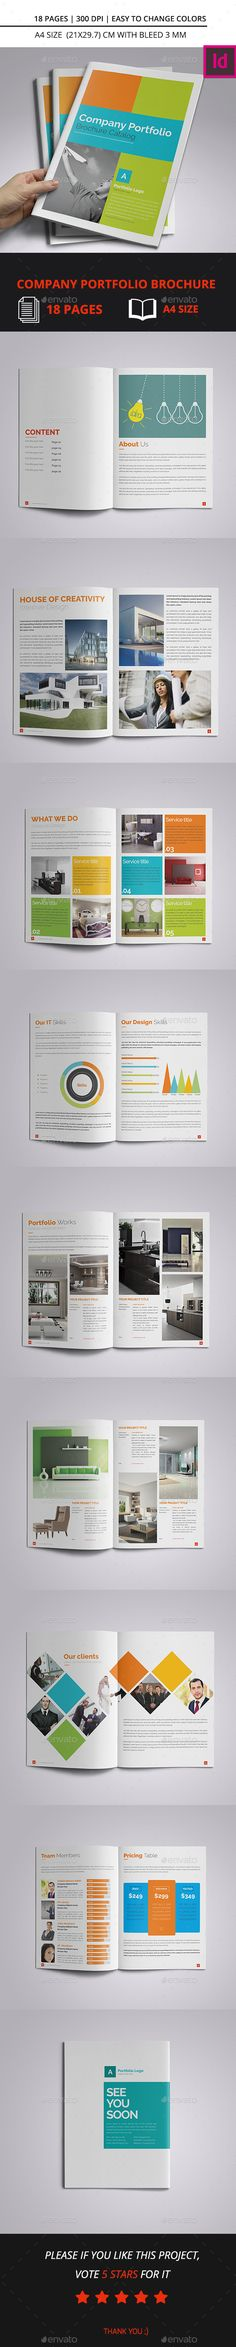 Company Portfolio Brochure Catalog A4 Template InDesign INDD #design Download: http://graphicriver.net/item/company-portfolio-brochure-catalog-a4/14053948?ref=ksioks